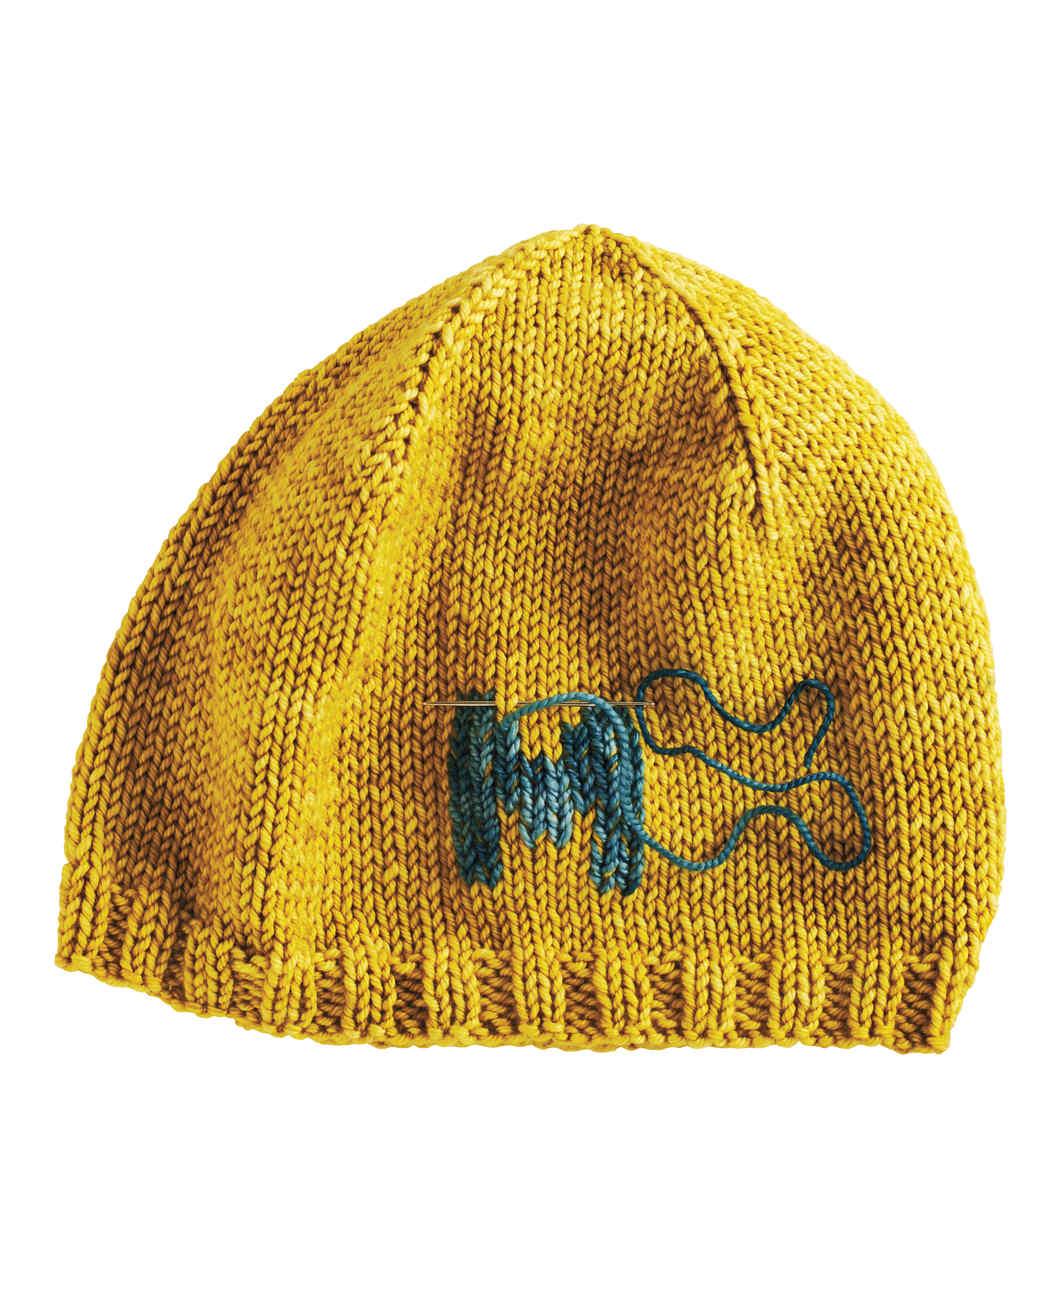 hat-silo-313-d111452.jpg